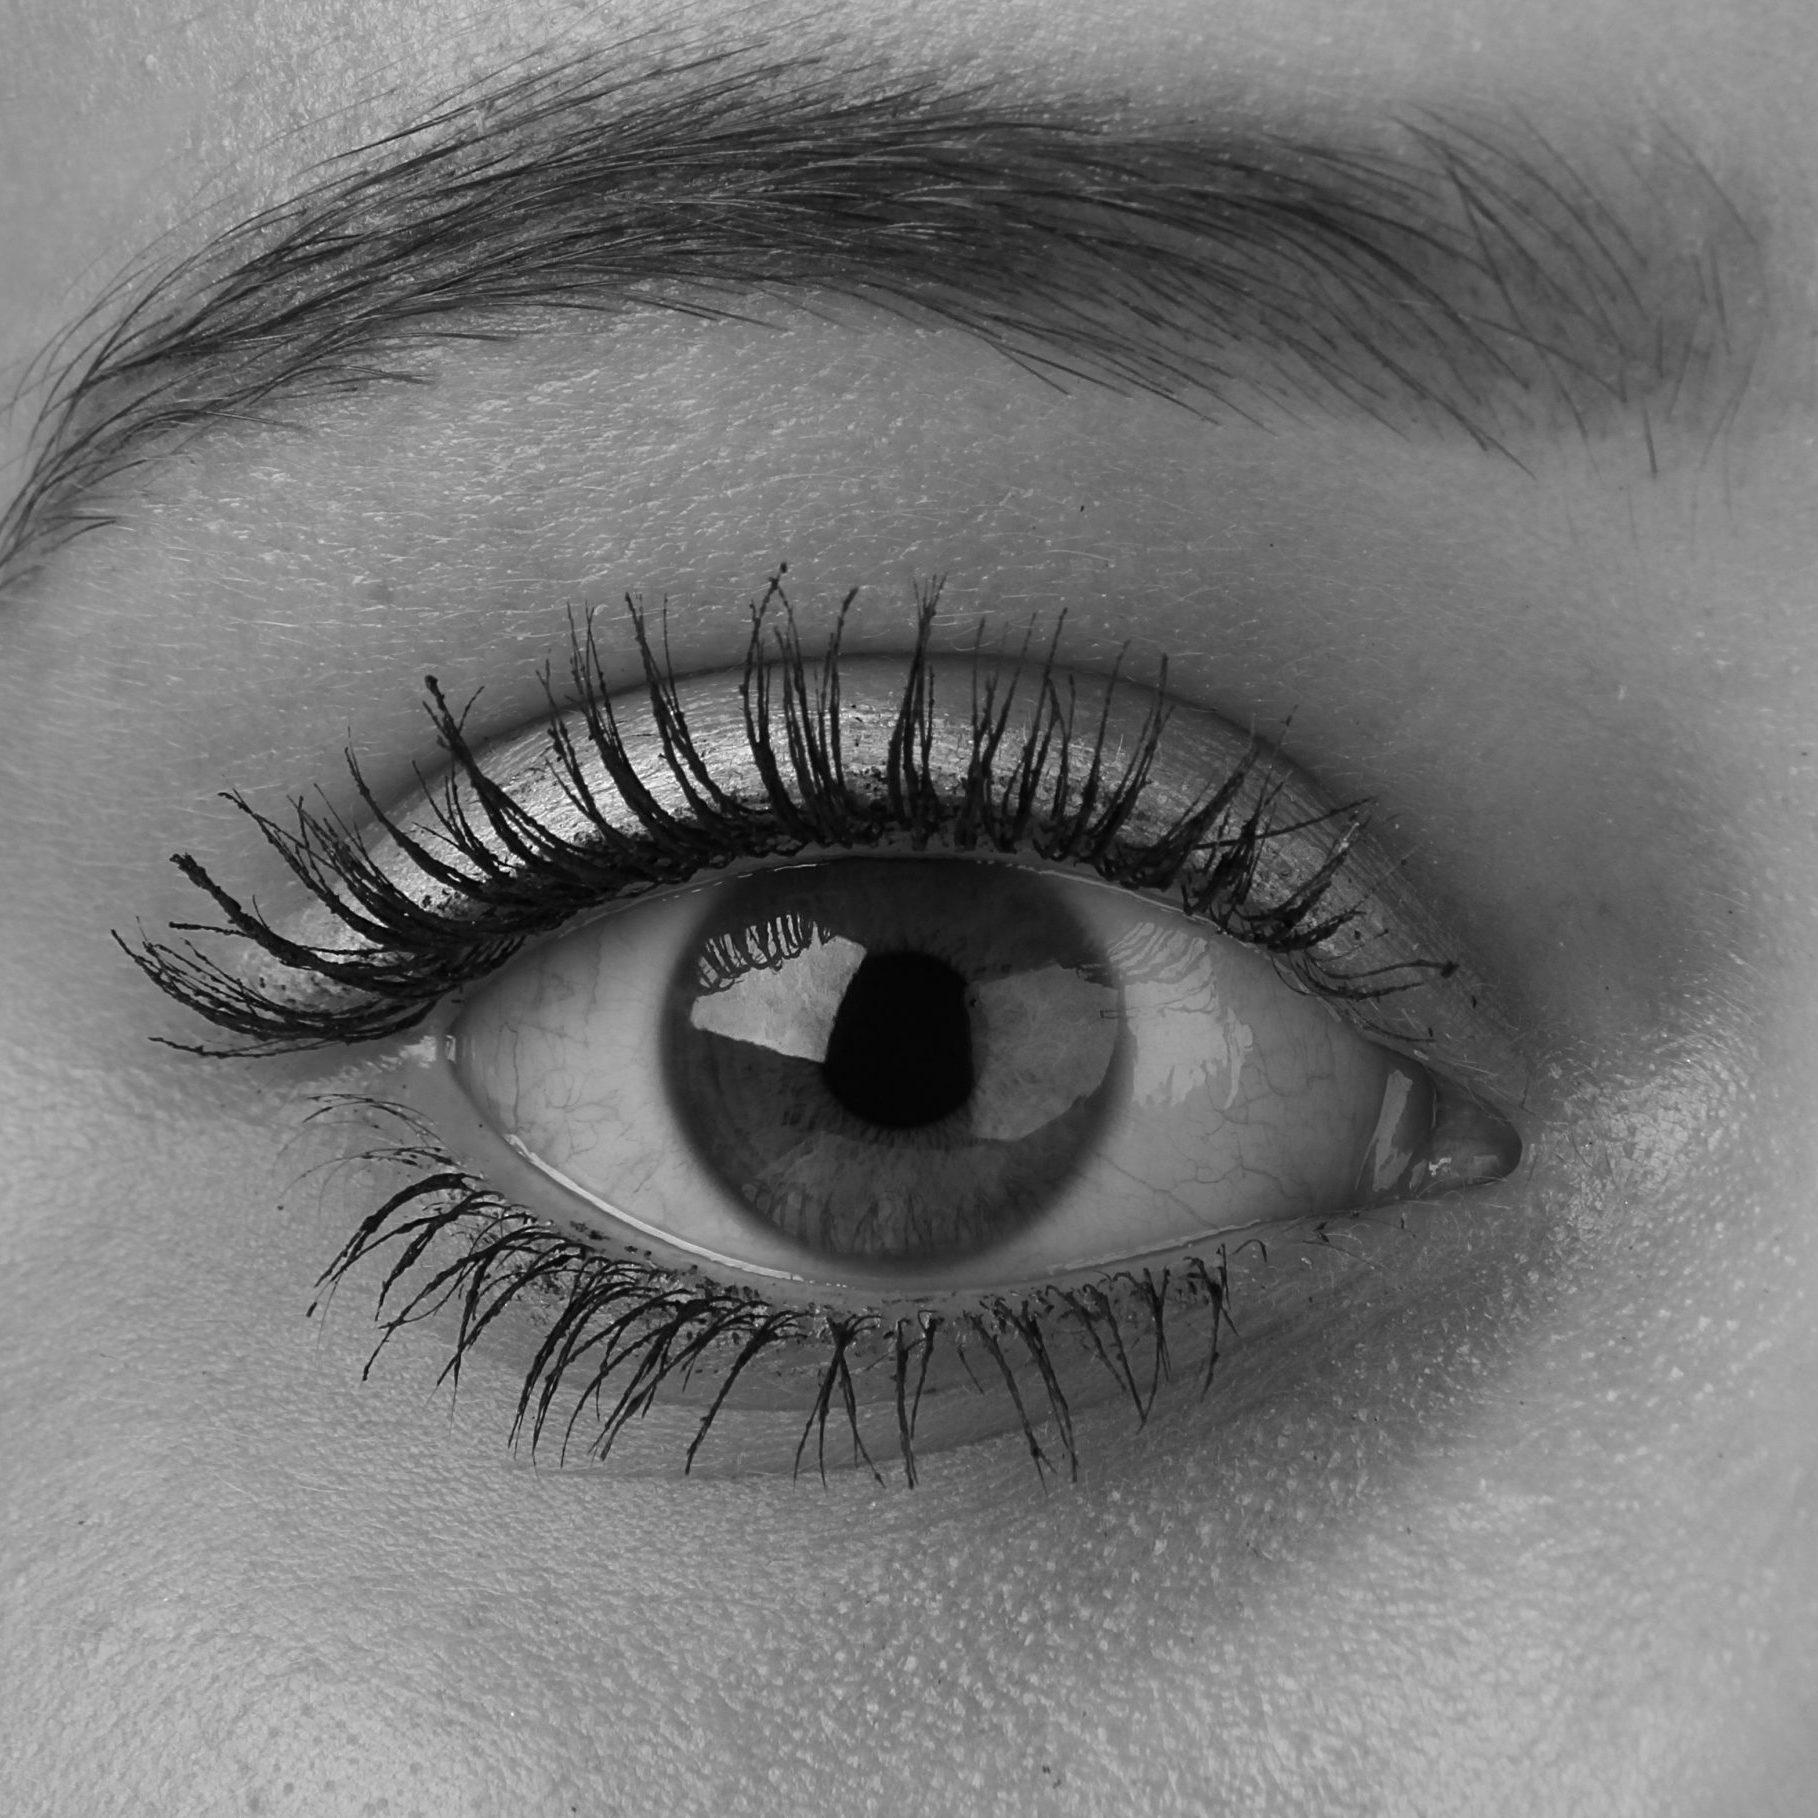 eyes-945248